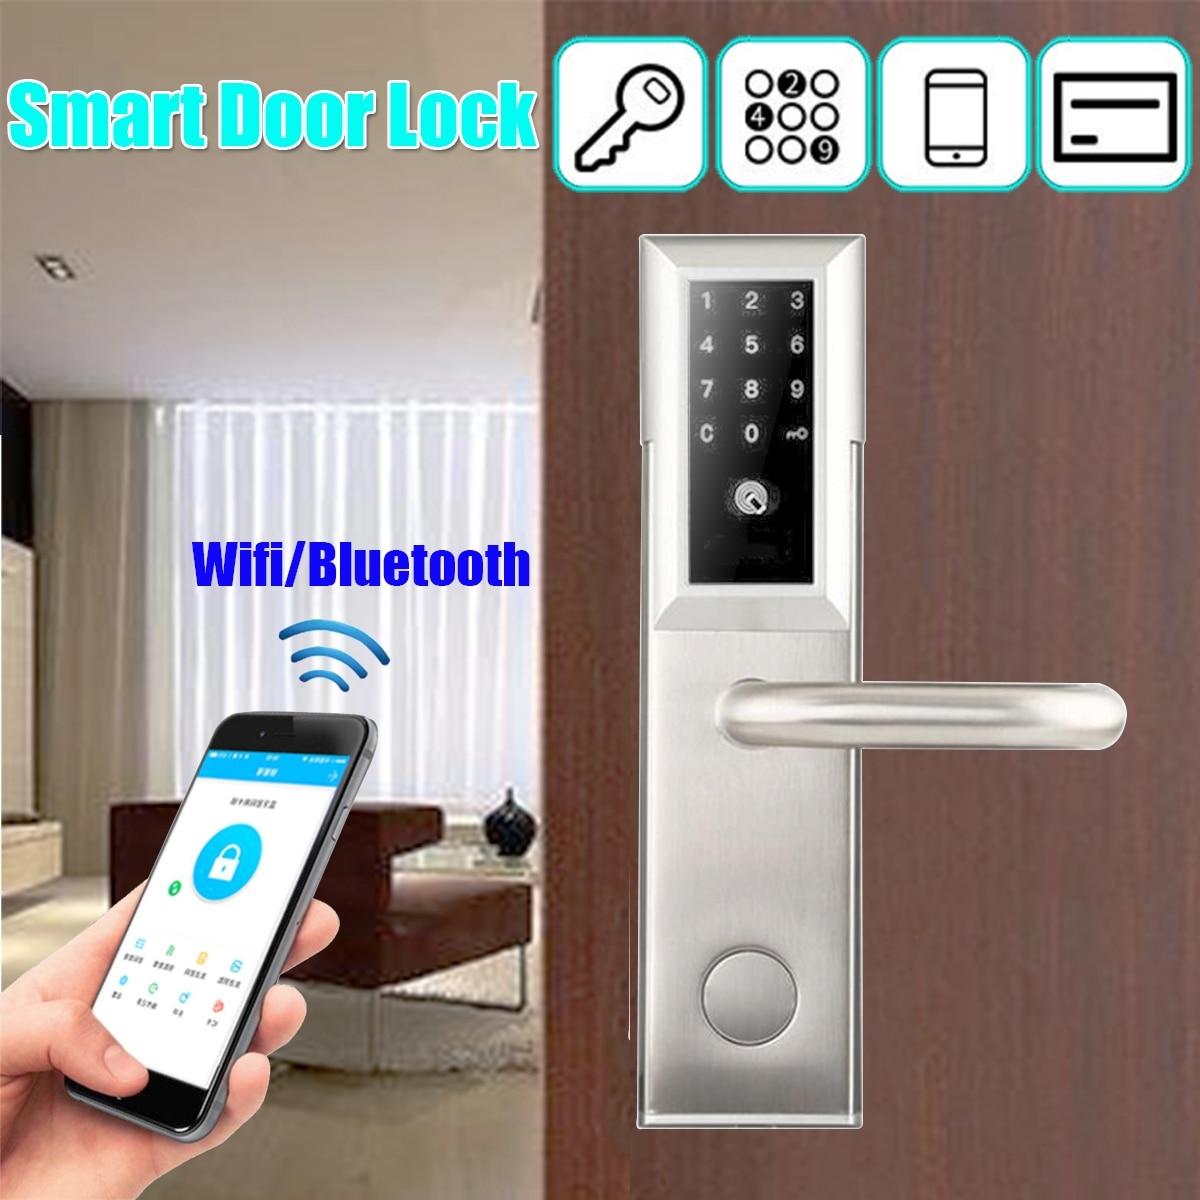 Prise de cadenas intelligente étanche pratique serrure de porte intelligente APP Mobile Durable Wifi bluetooth mot de passe serrure de porte intelligente